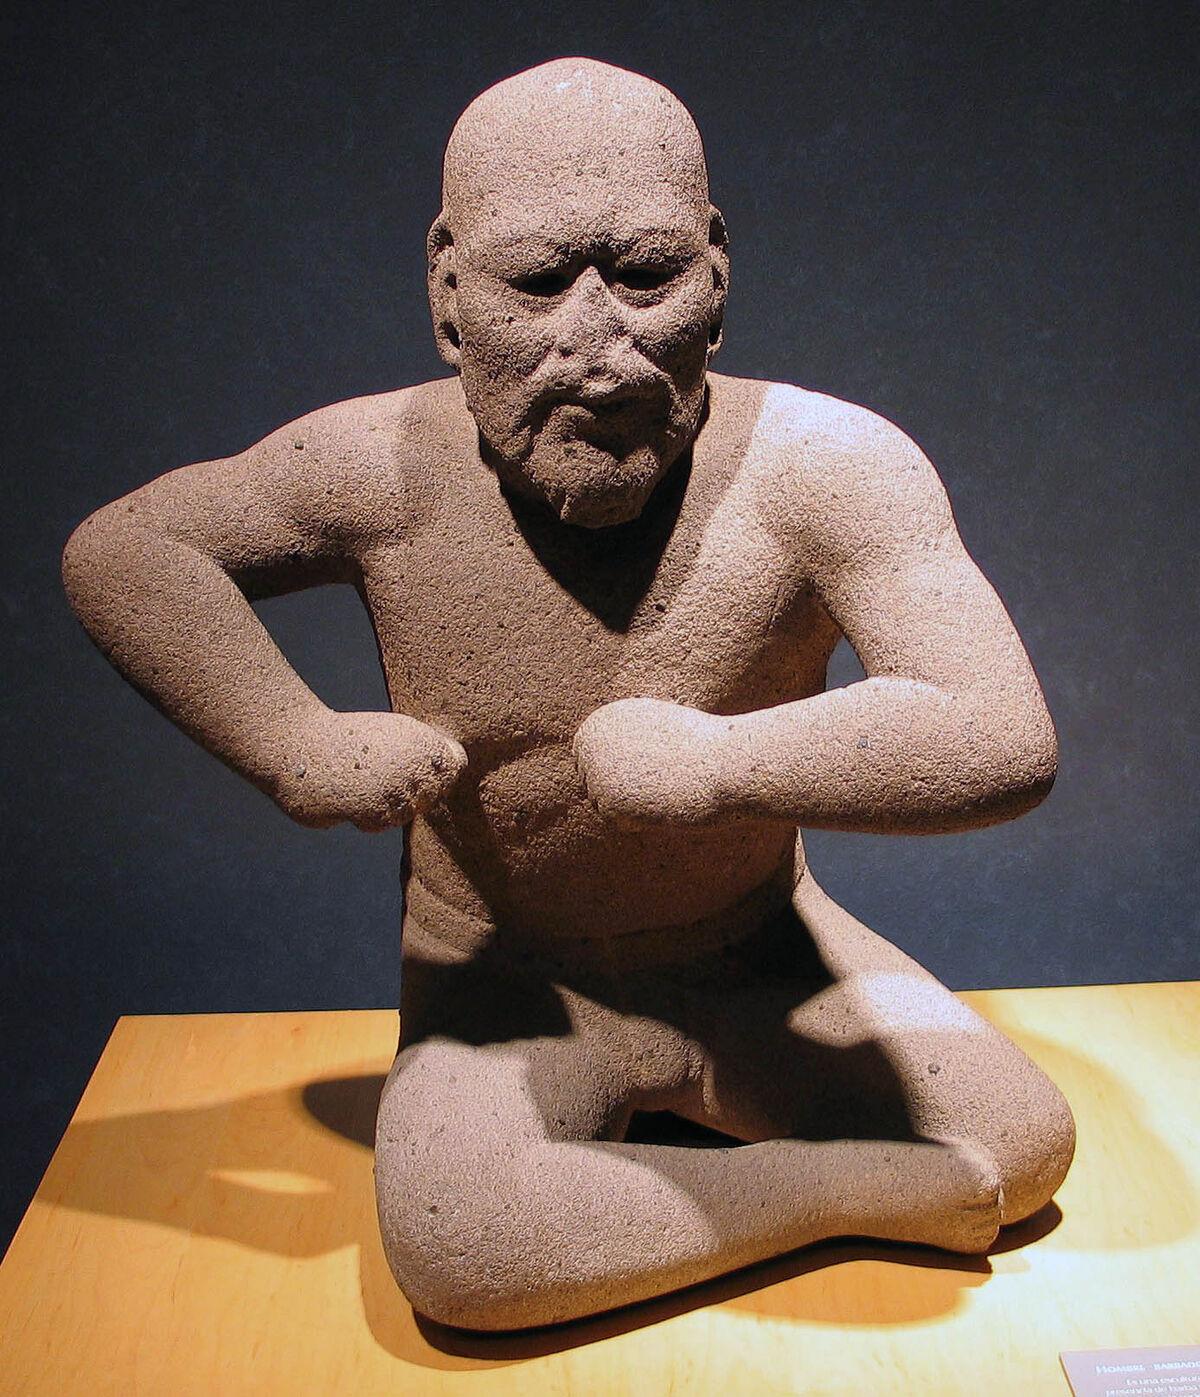 Olmec wrestler (Luchador Olmeca). Photo via Wikimedia Commons.